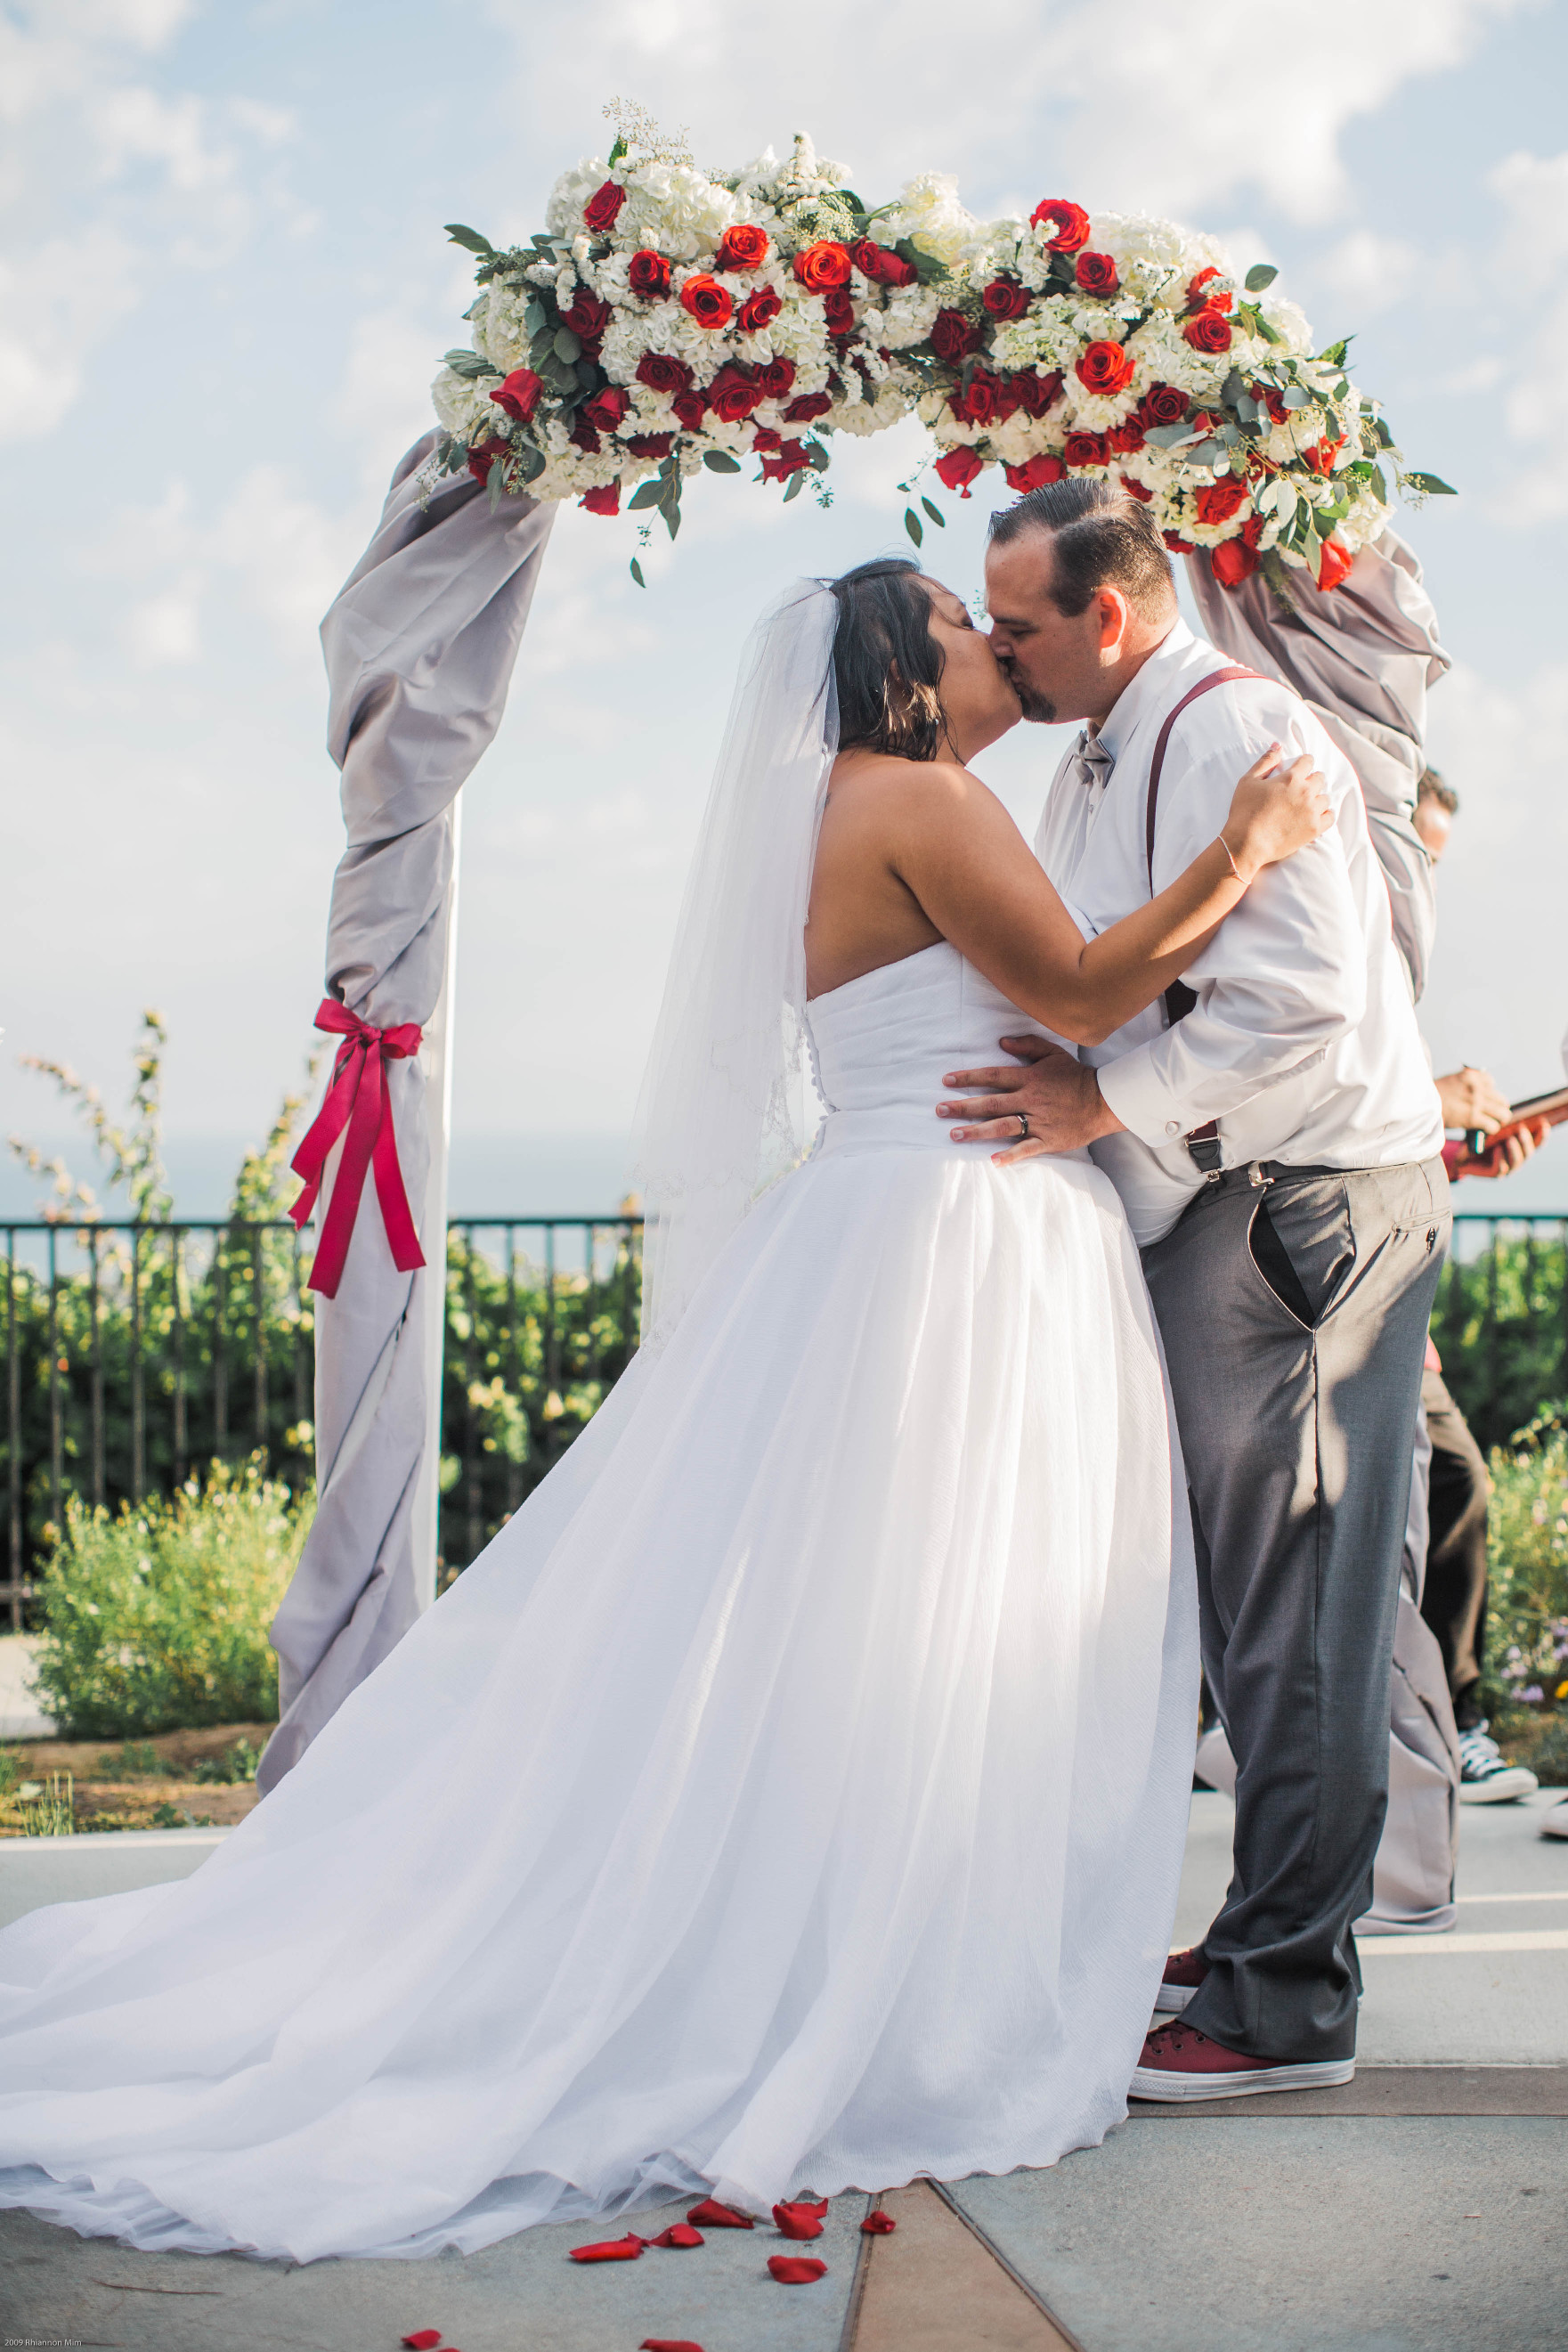 20170909_Wedding_0925